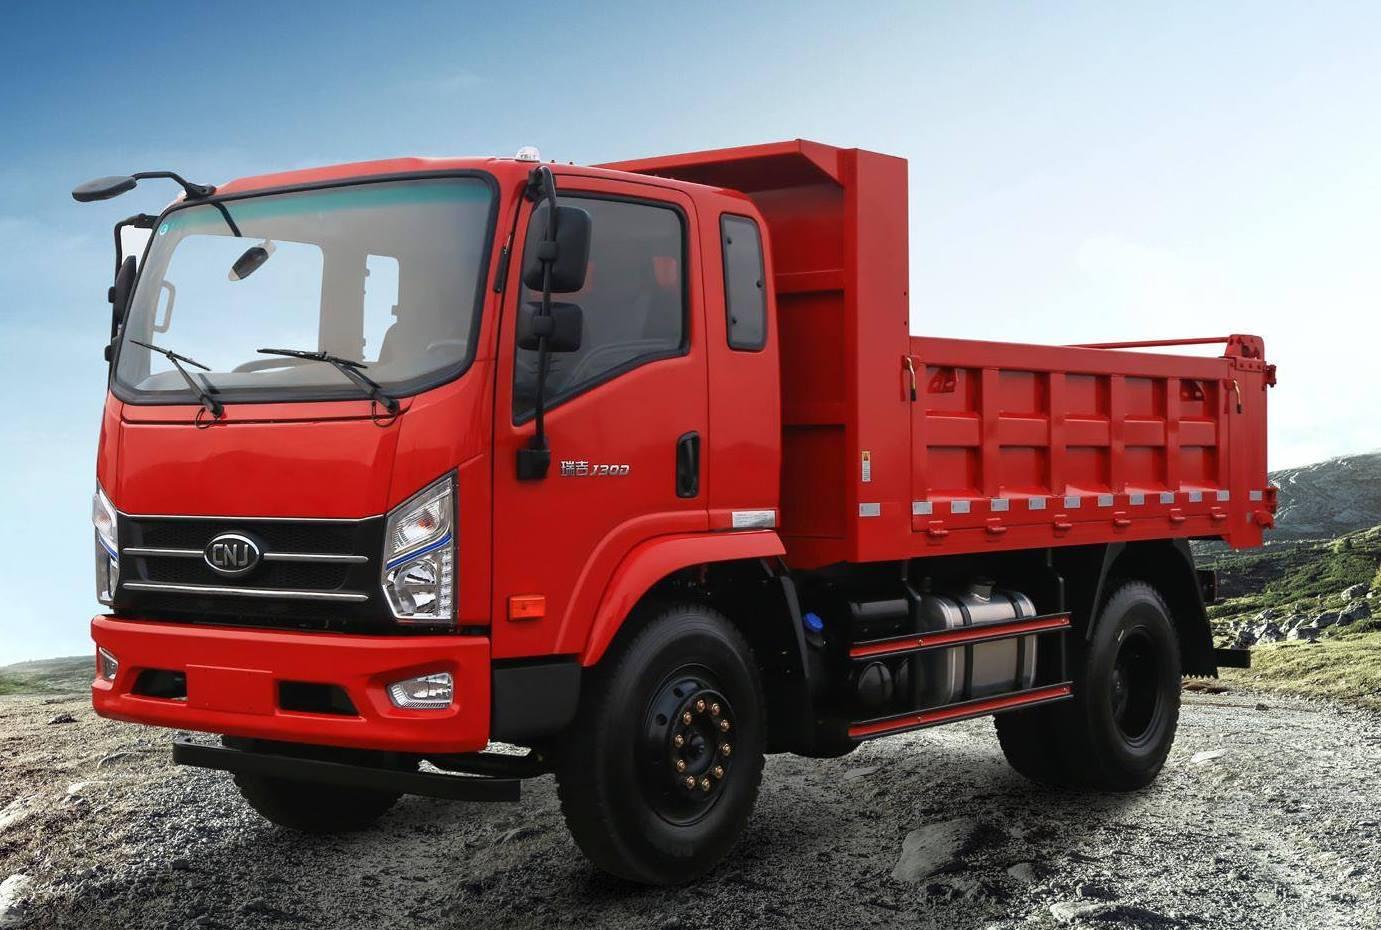 Dumper---diesel-motor-van-80-pk-tot-180-pk---lading-van-4-ton-tot-20-ton8